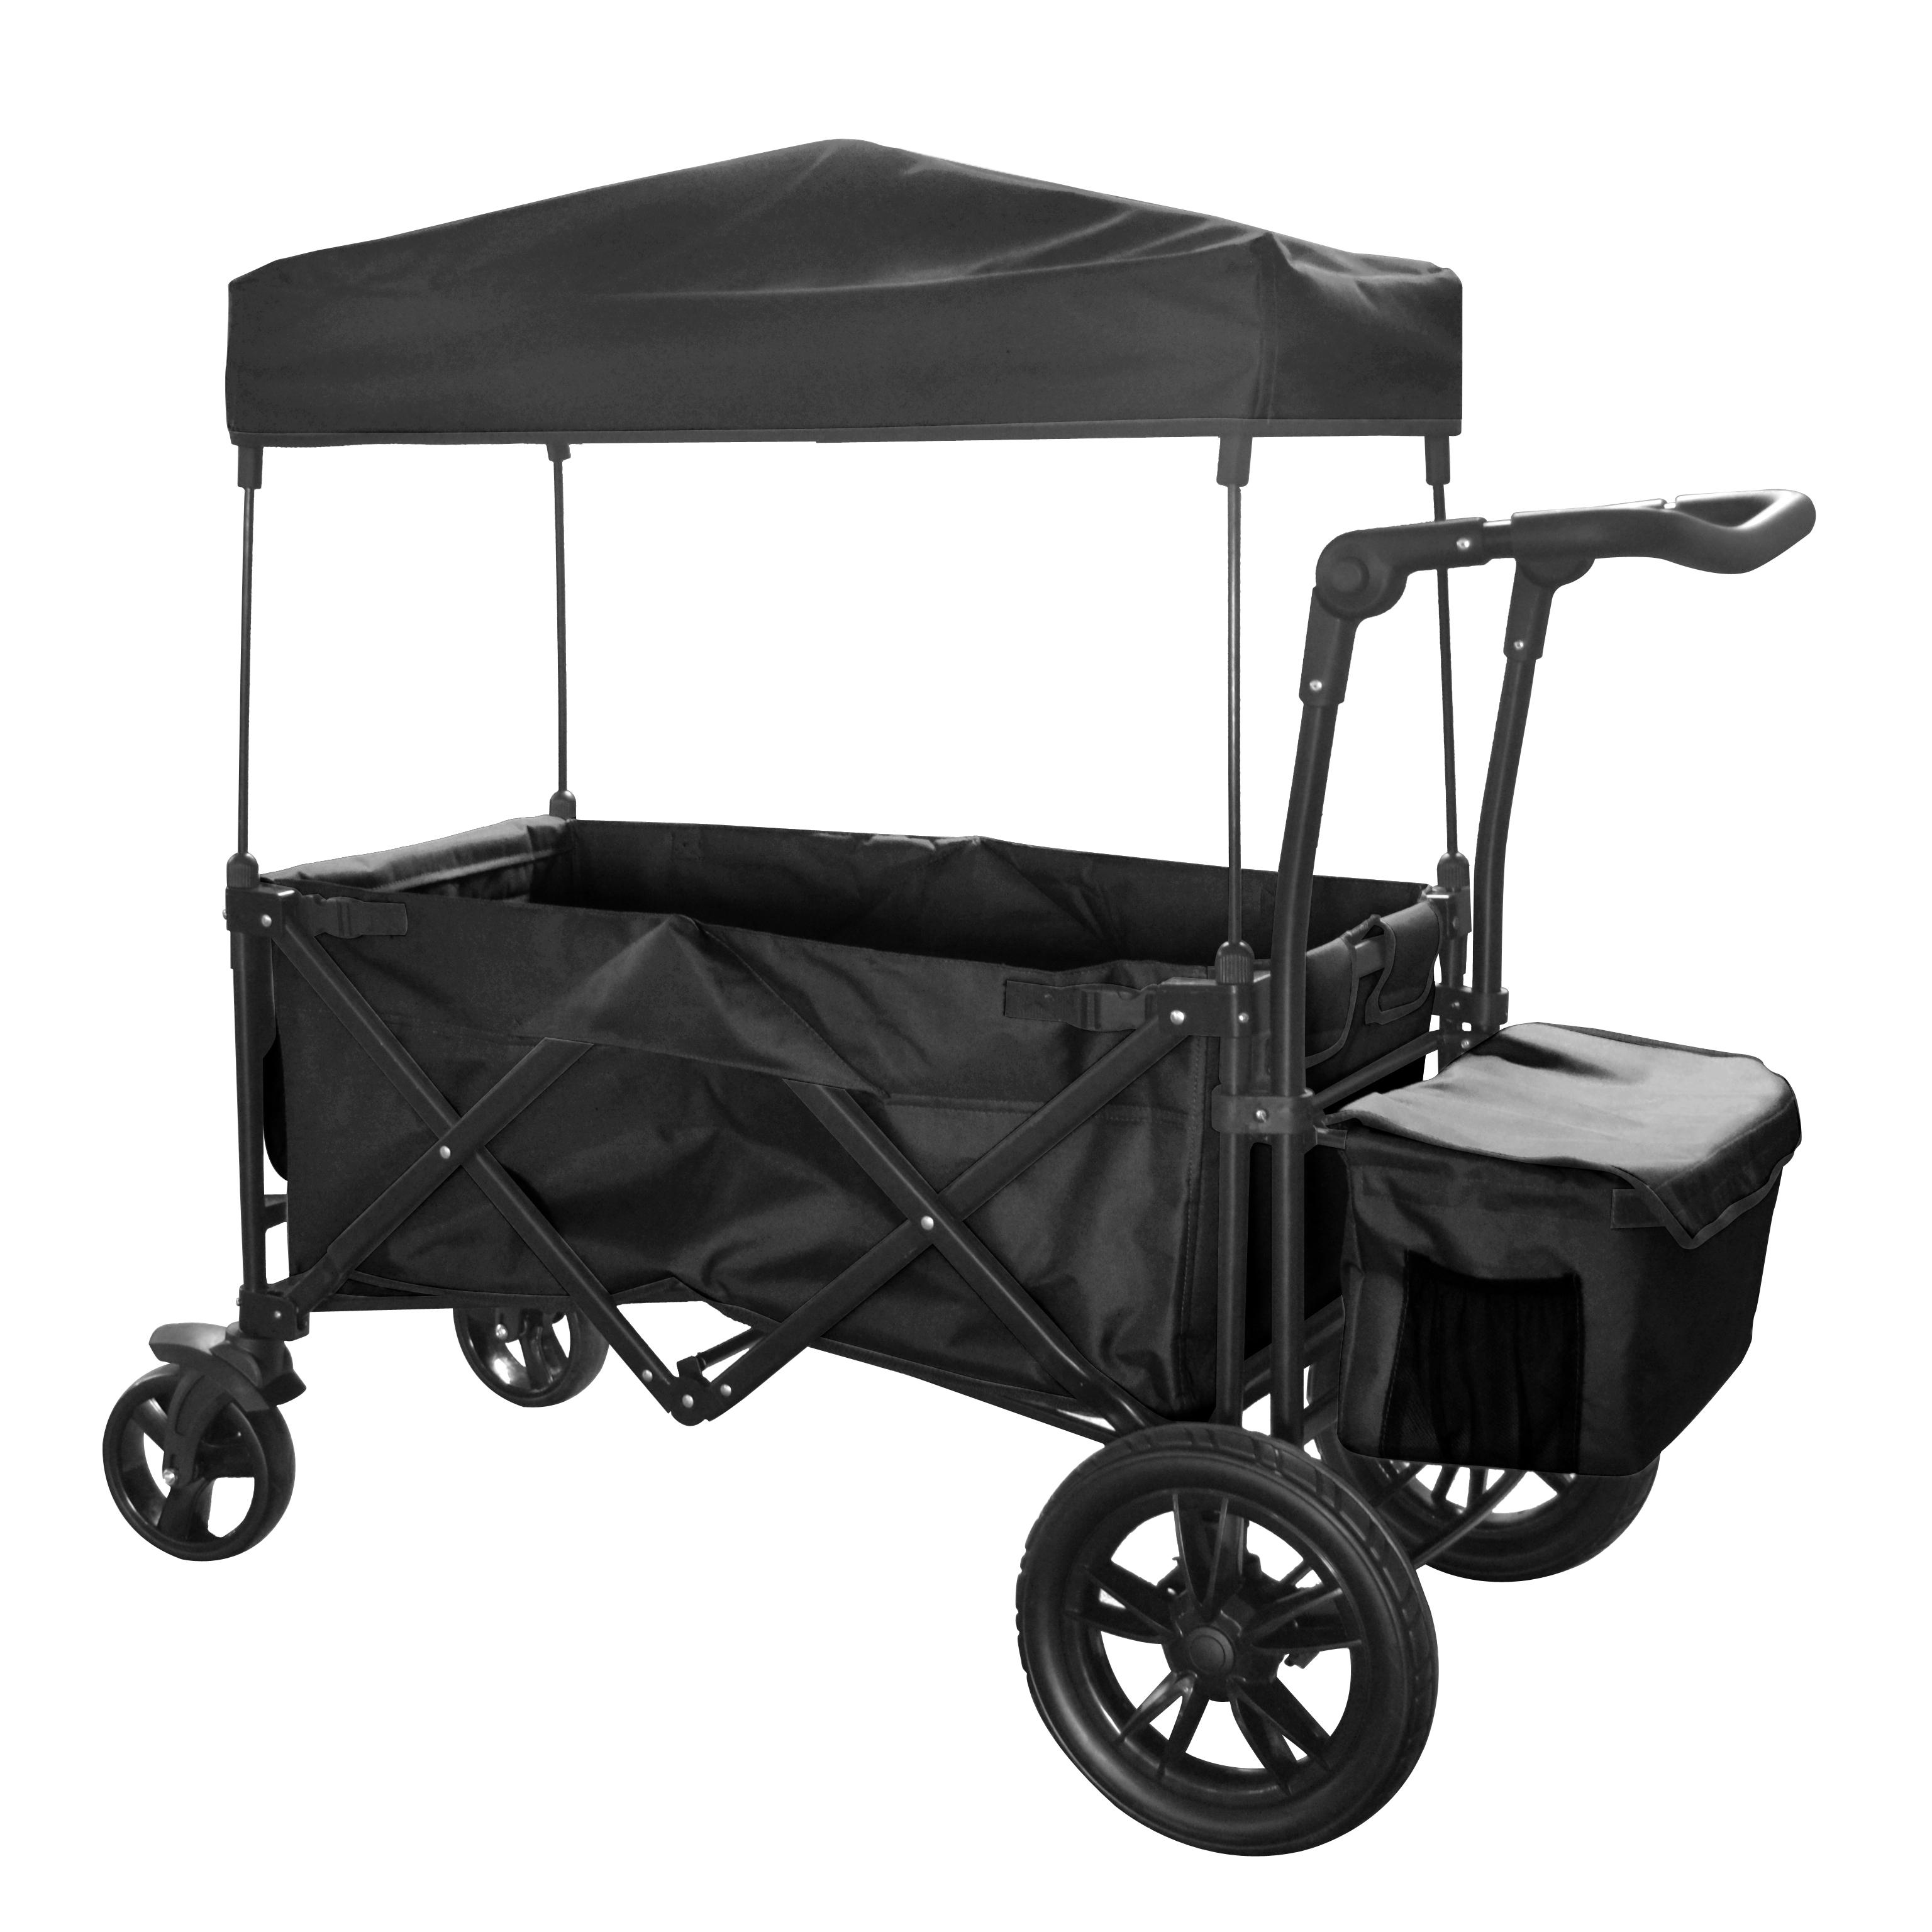 black outdoor folding push wagon canopy garden utility travel cart tires brake ebay. Black Bedroom Furniture Sets. Home Design Ideas